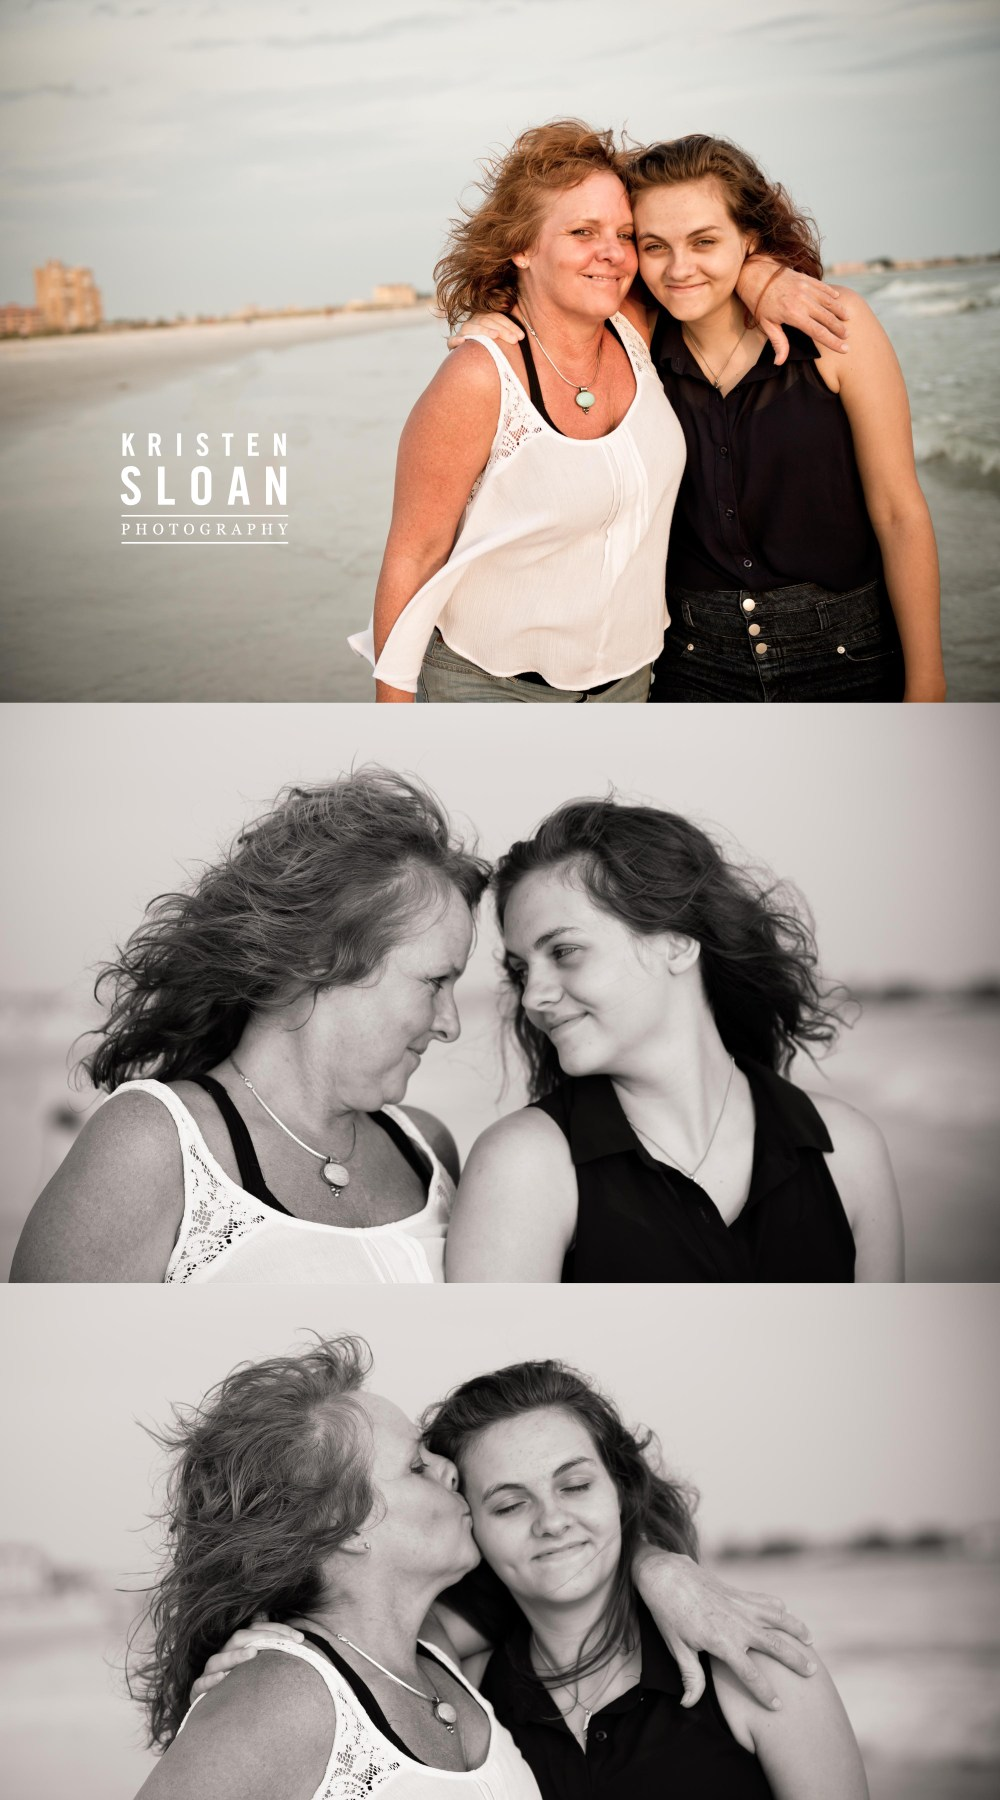 St Pete Beach FL Family Baby Kids Photographer Kristen Sloan